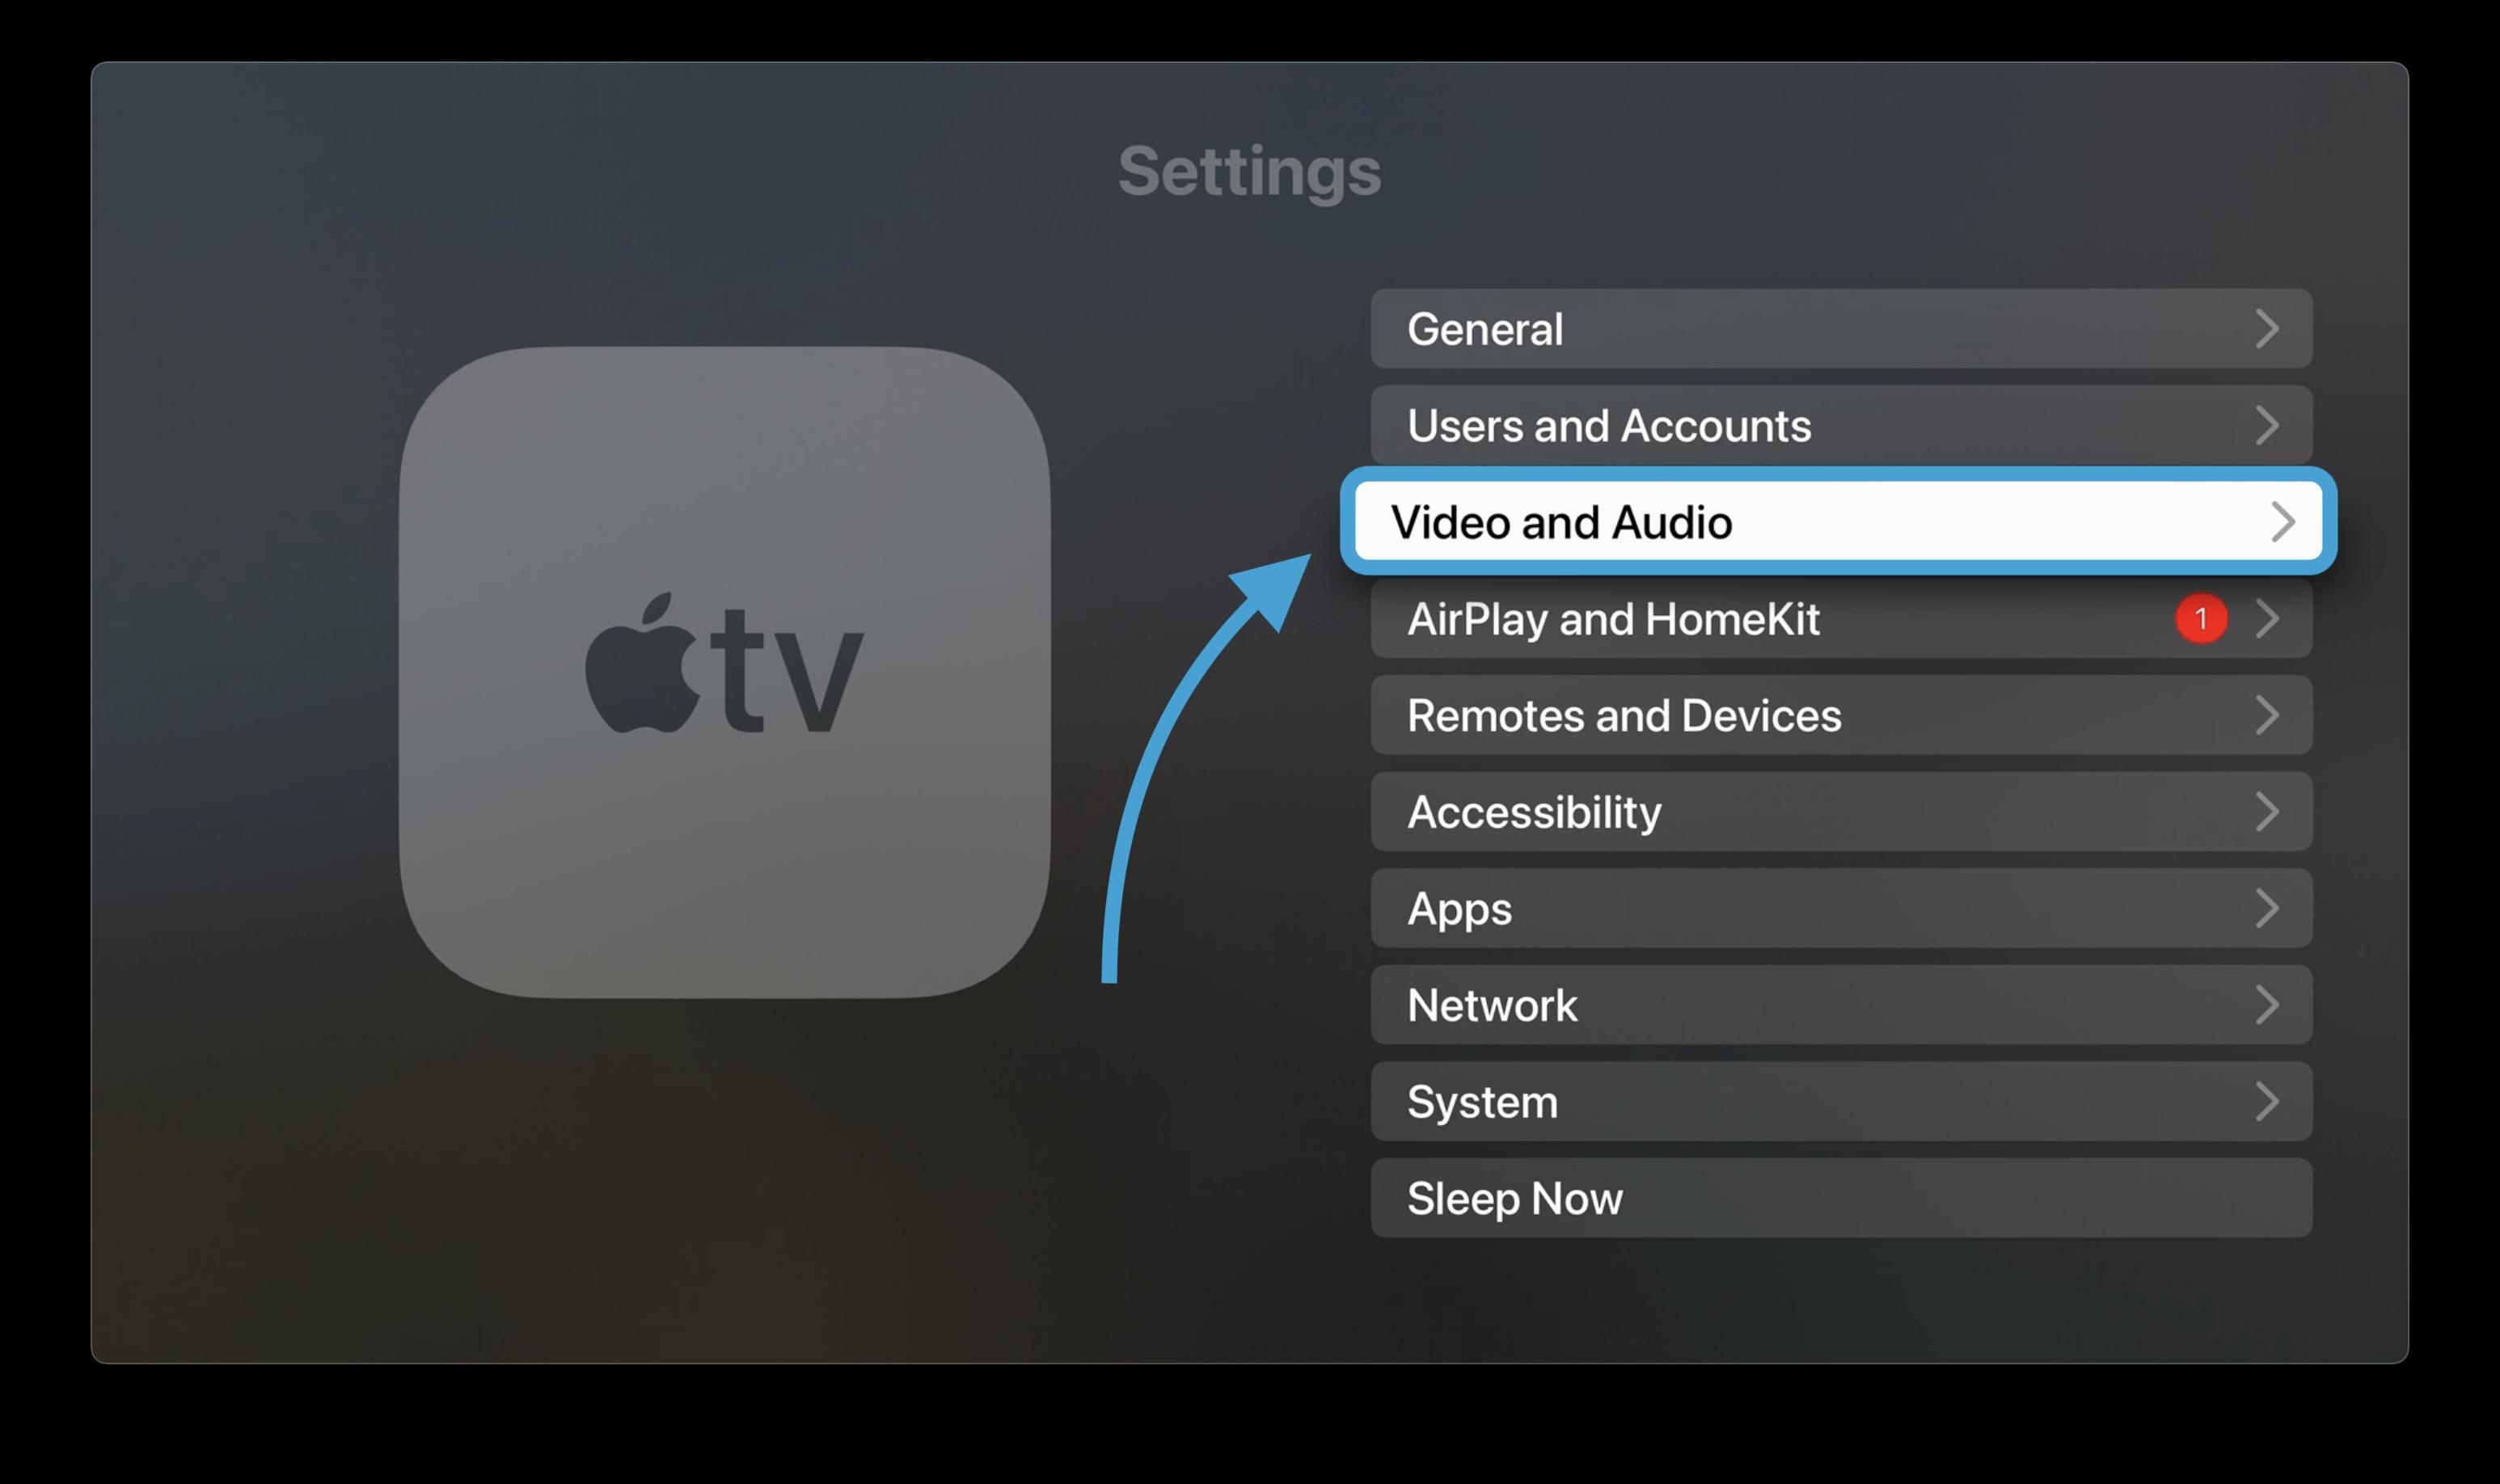 How to set HomePod as Apple TV default speakers walkthrough 1 - Choose Video and Audio in Settings